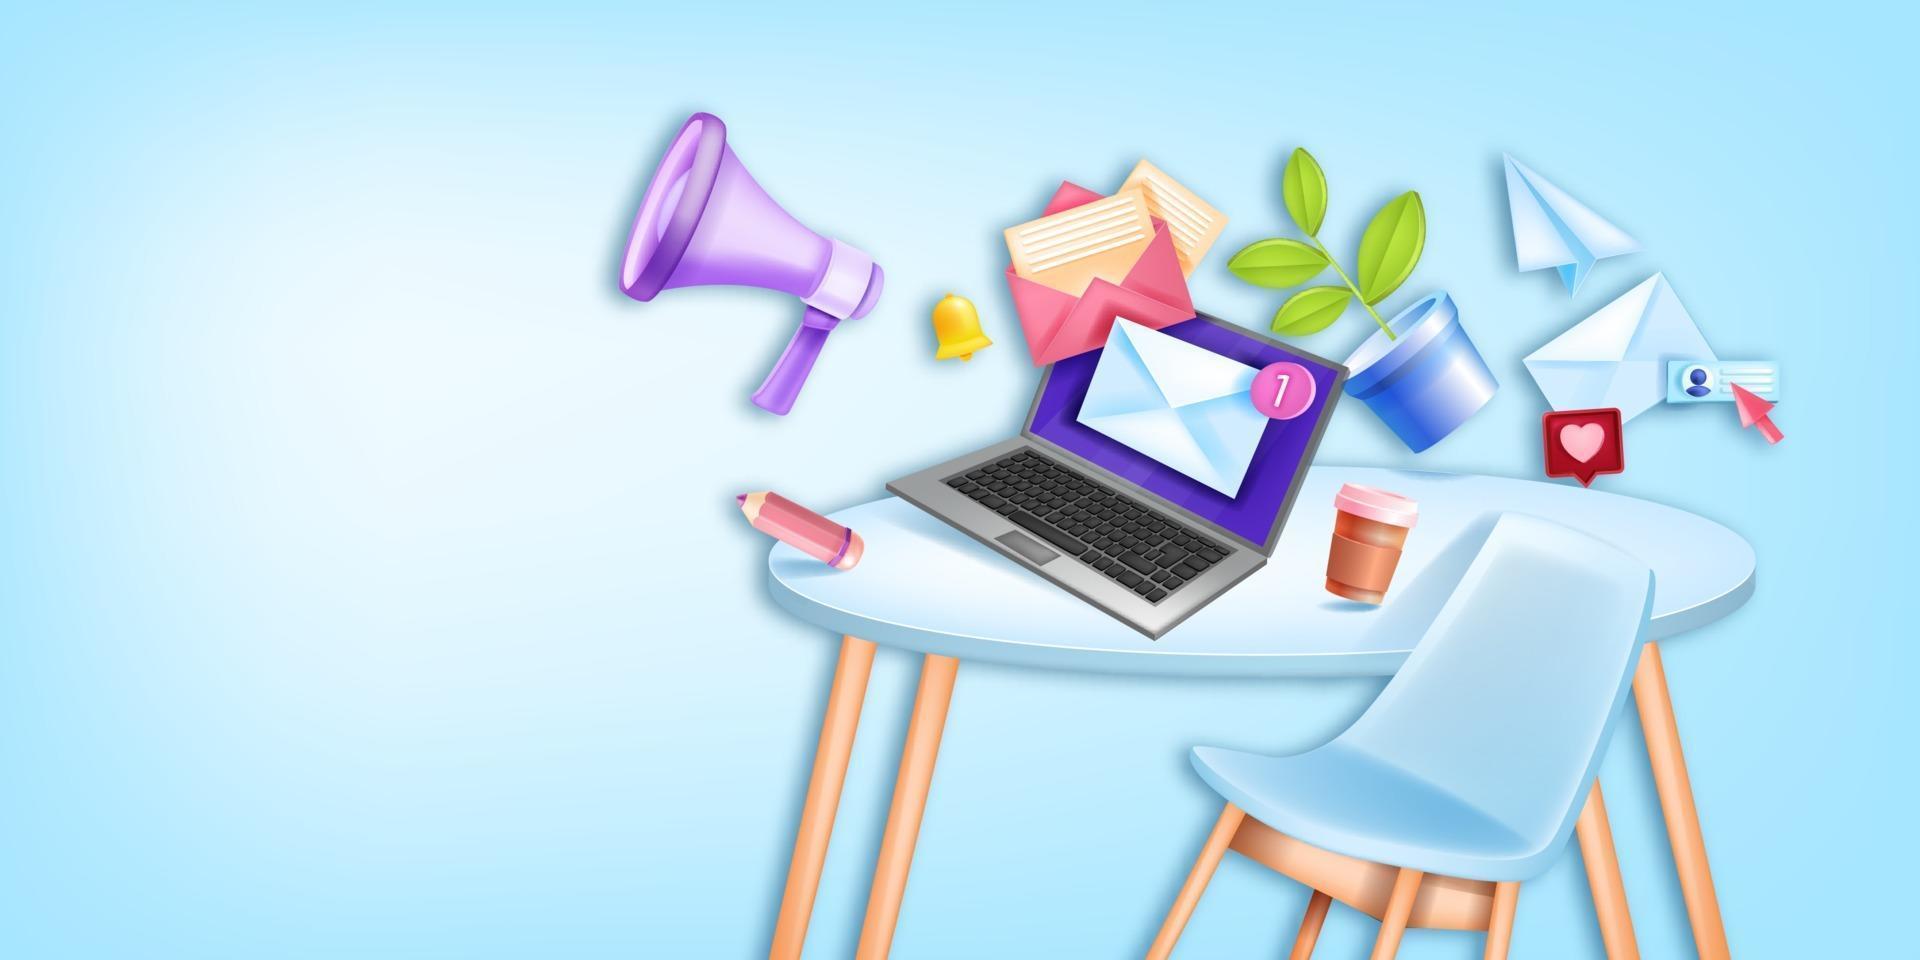 Email business online marketing vector background, office workplace, furniture laptop screen, megaphone. Digital network social media concept, banner. Email web marketing freelance design illustration